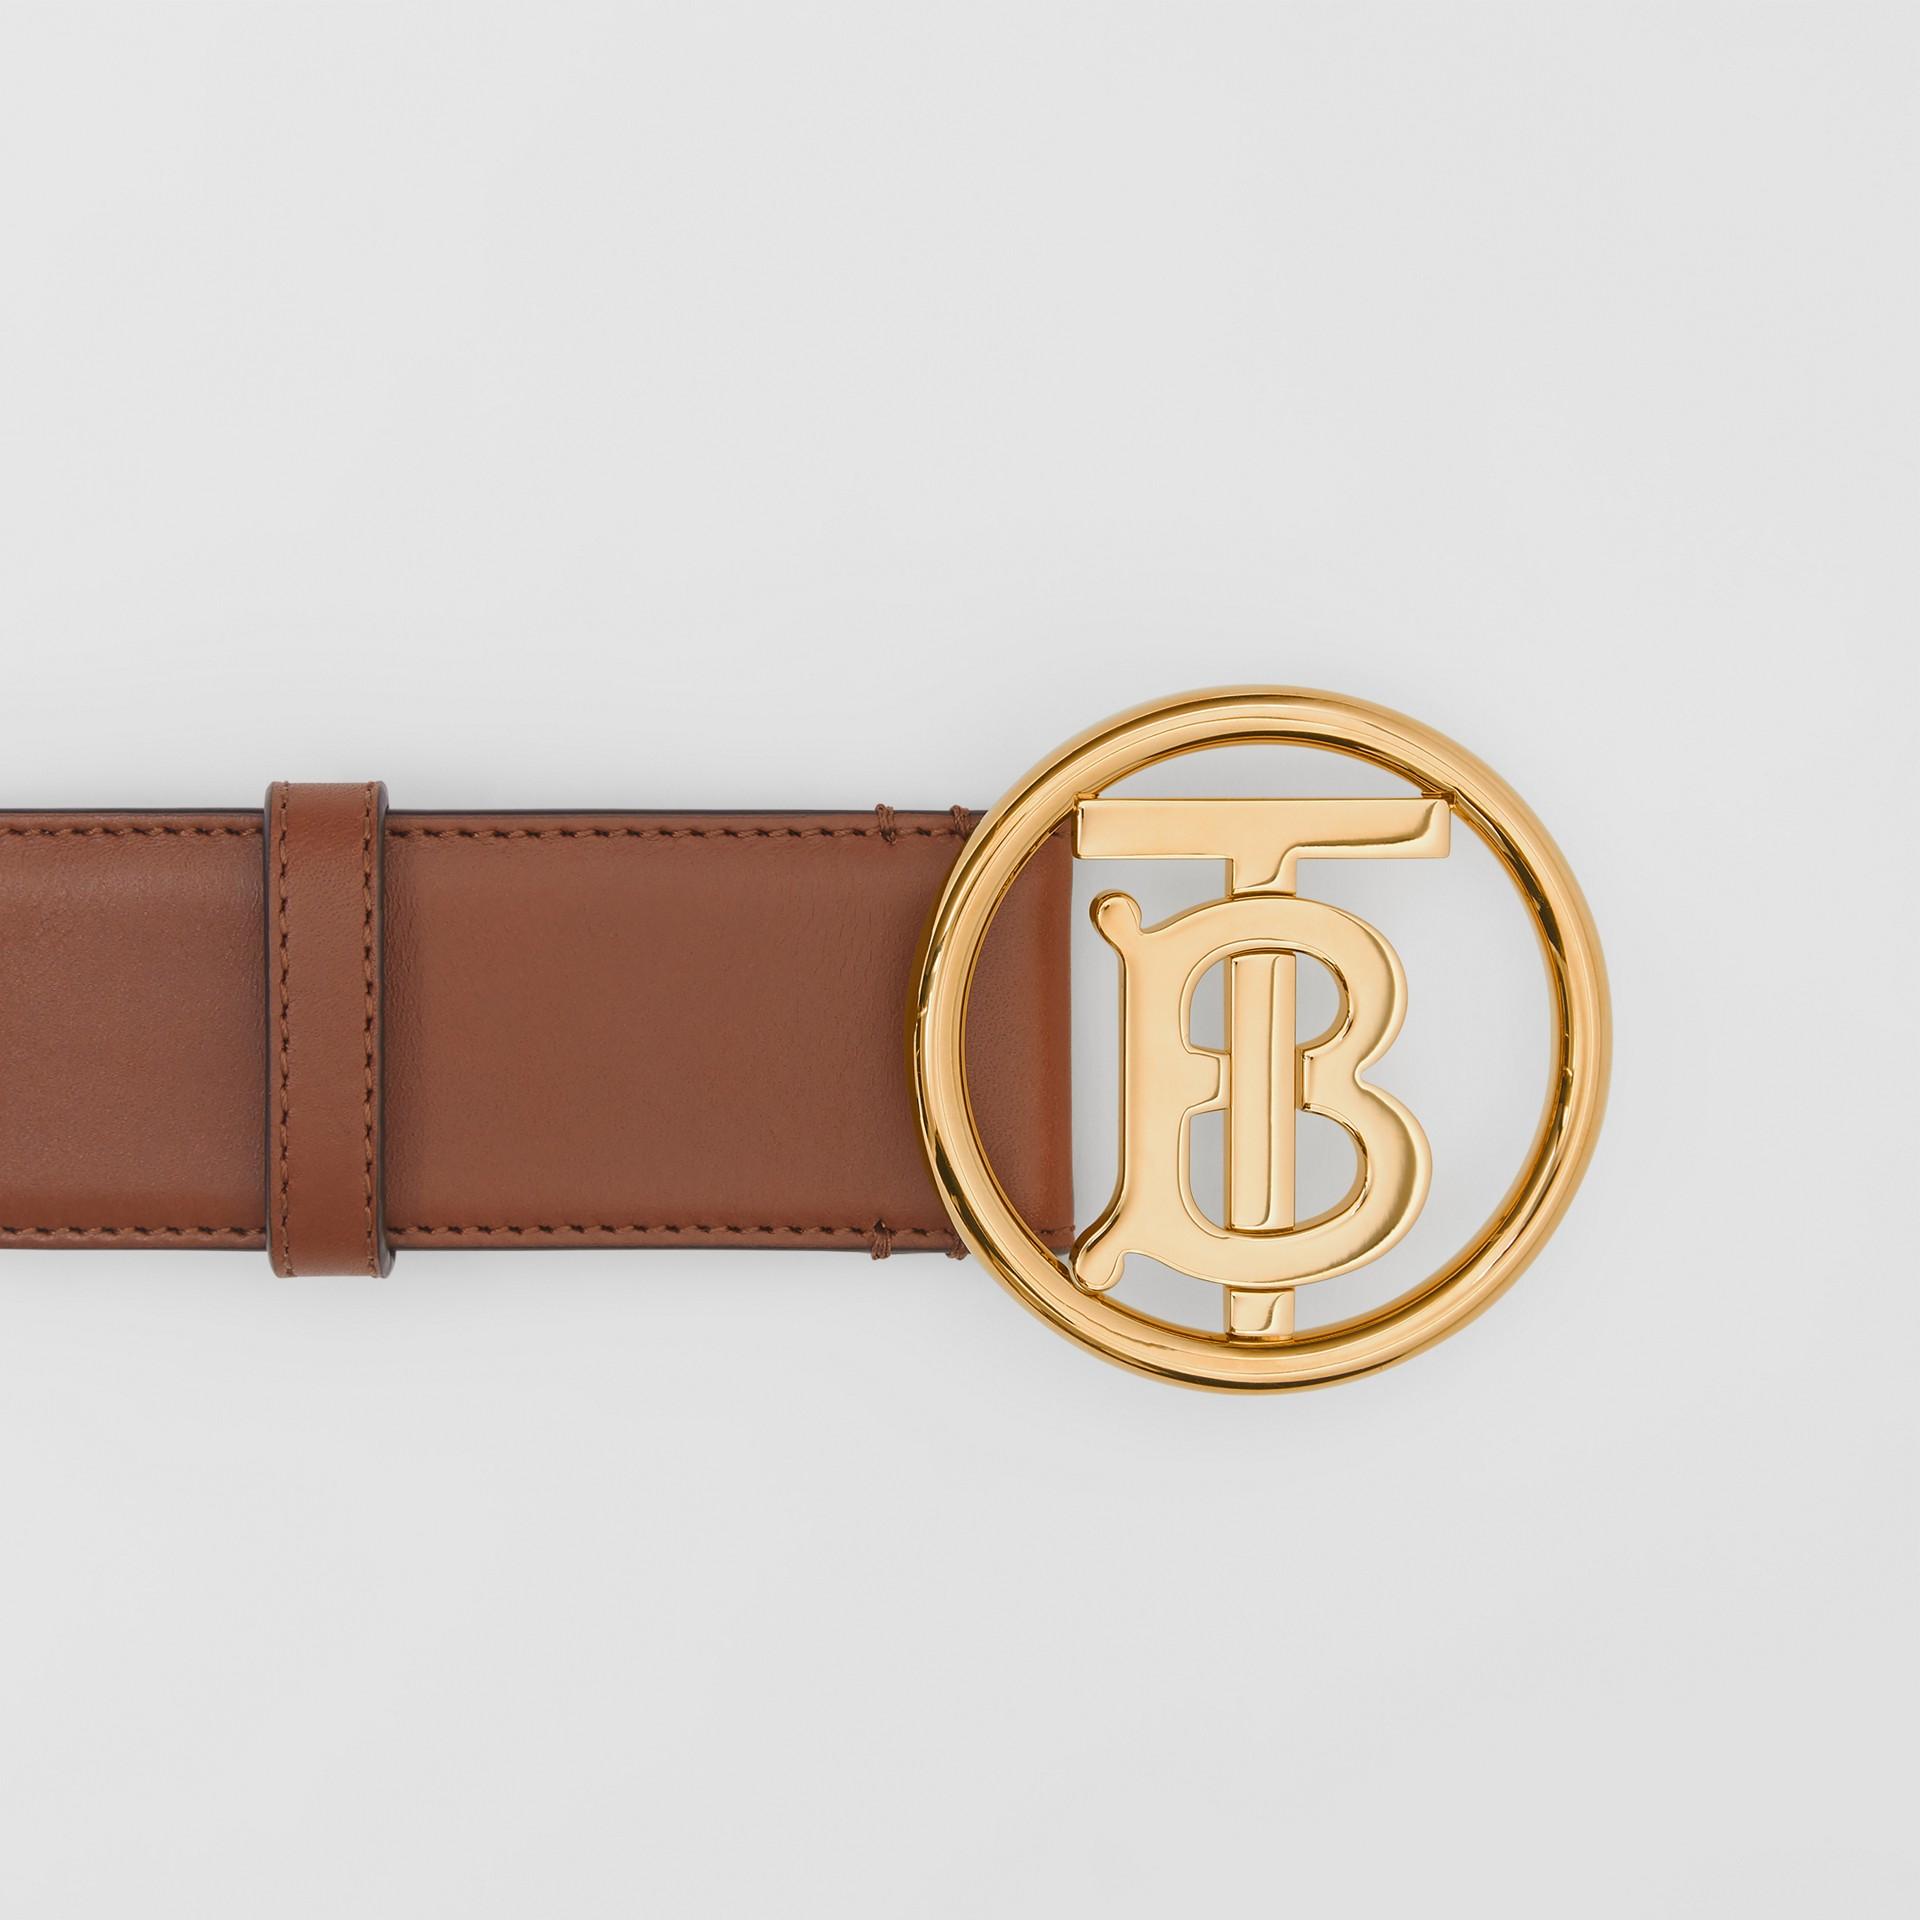 Monogram Motif Leather Belt in Tan/antique Dark Brass - Women | Burberry Canada - gallery image 1